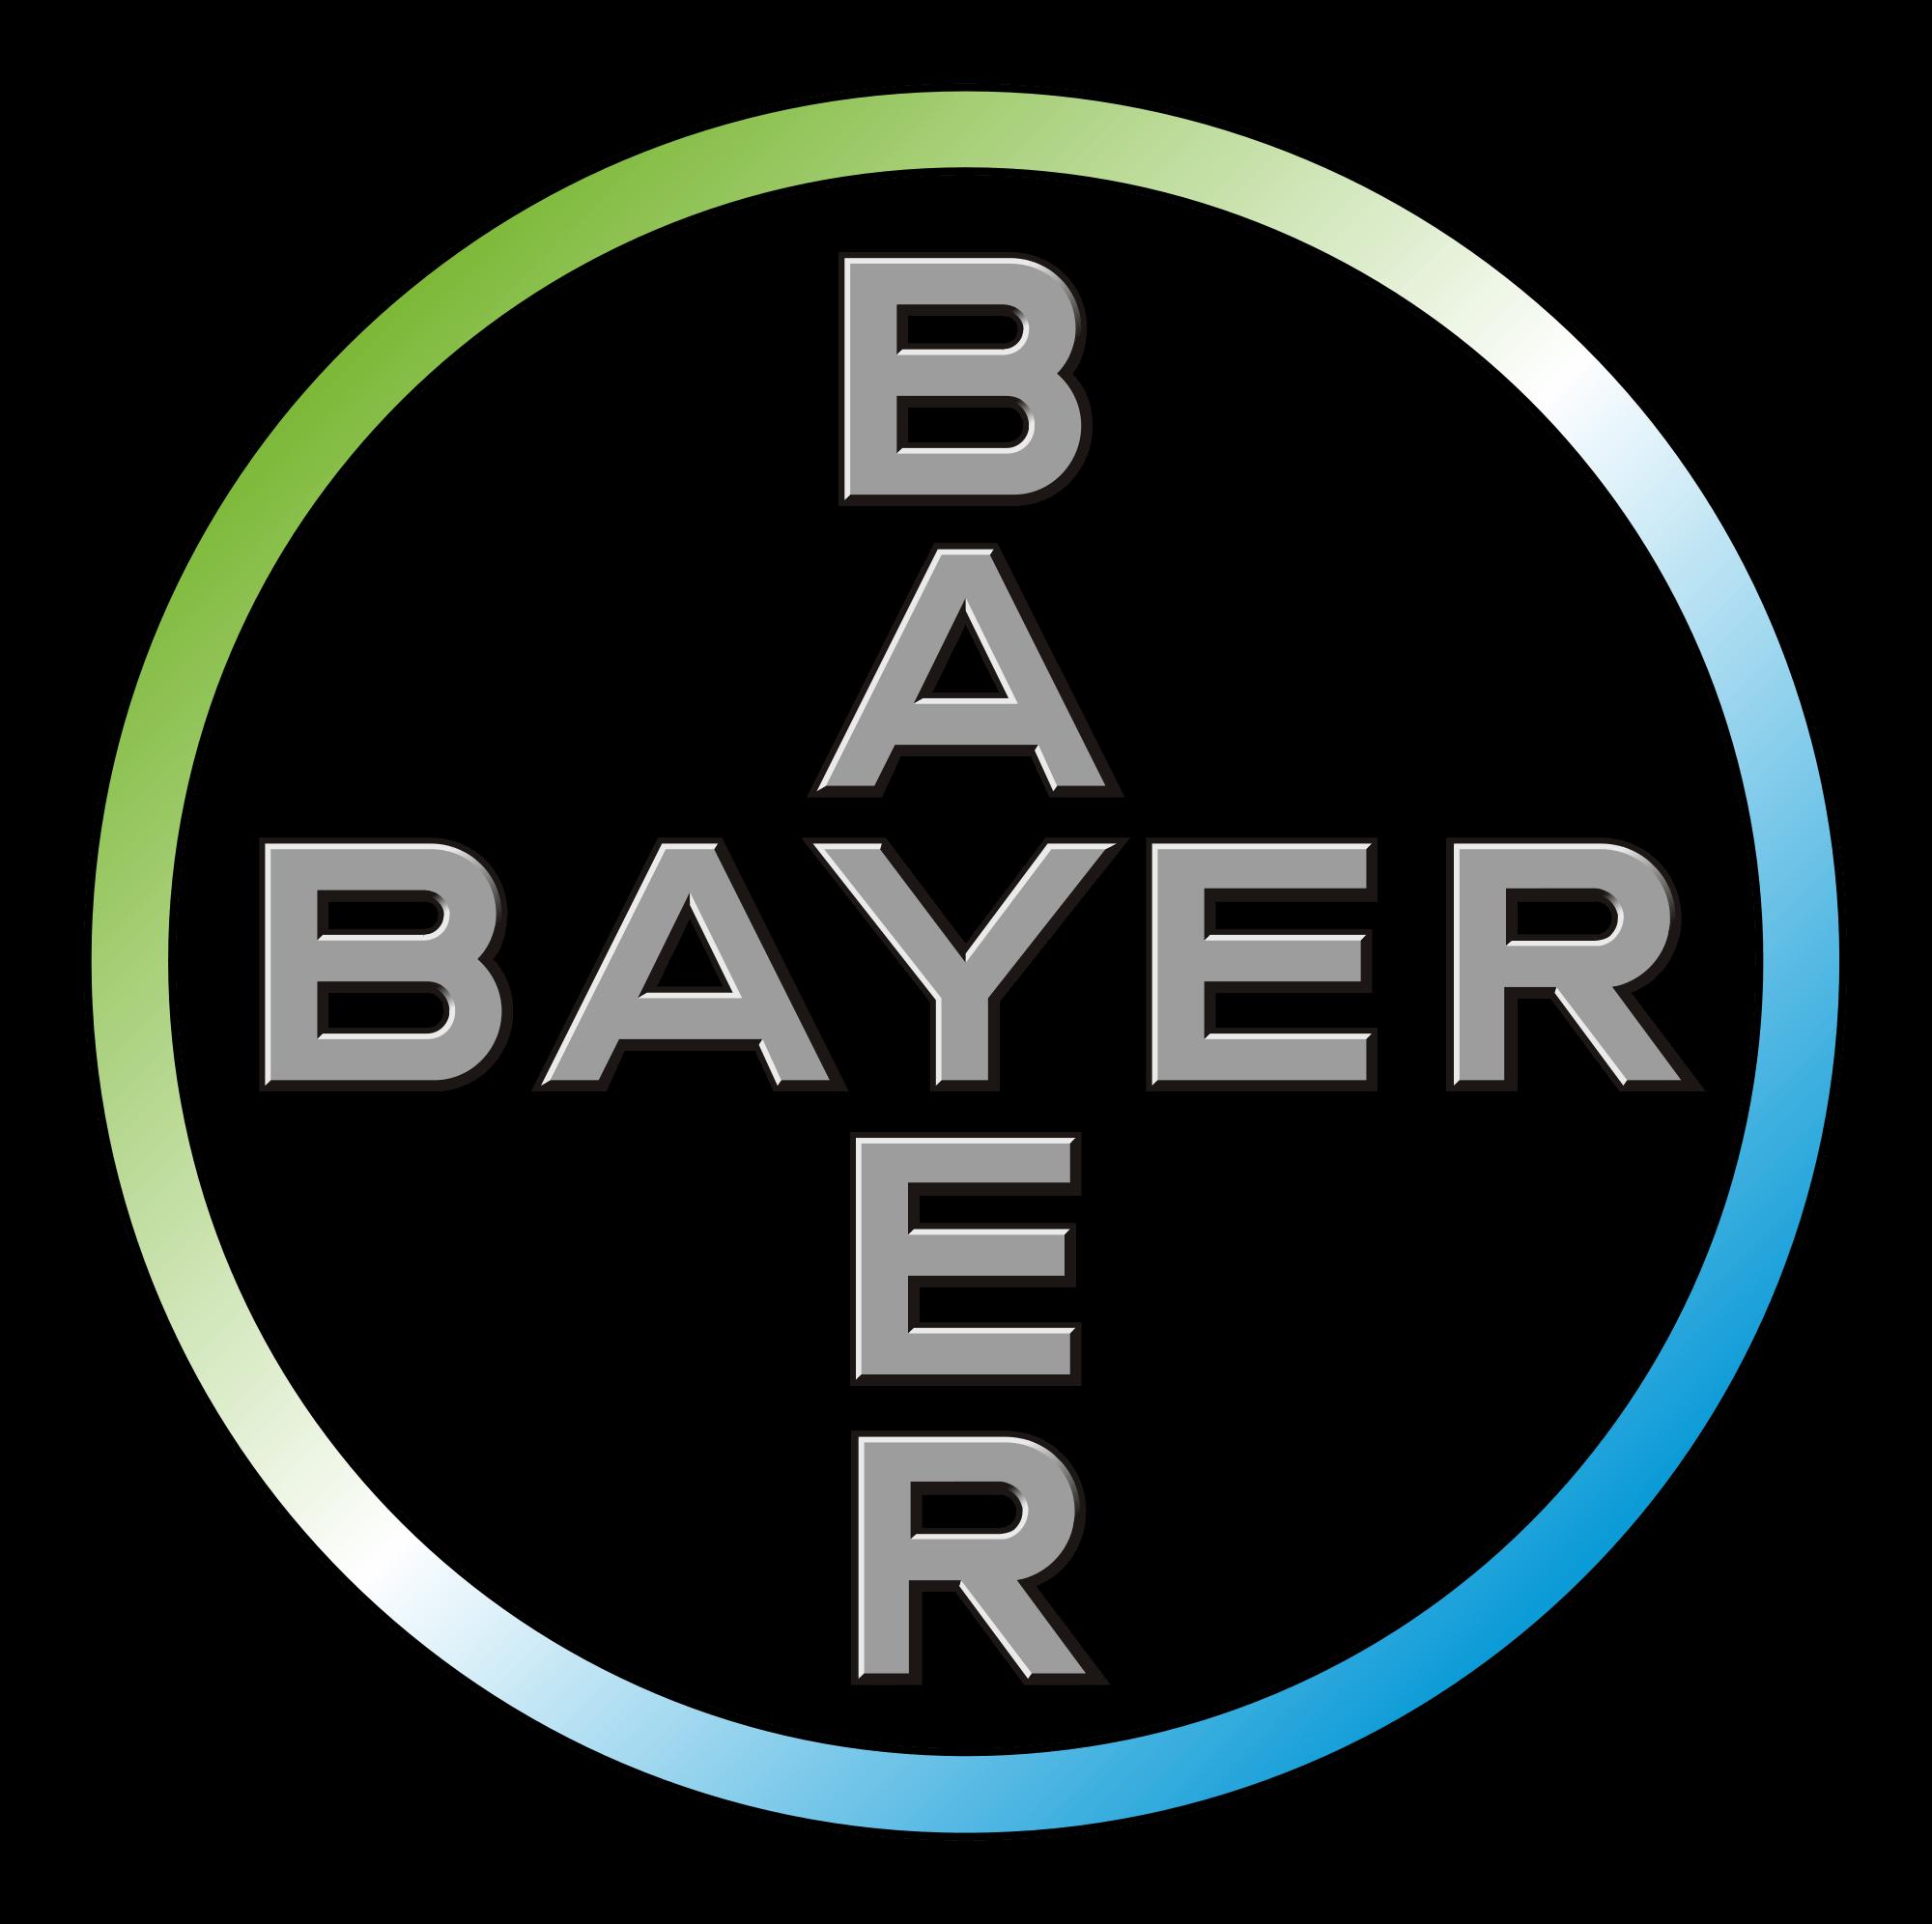 BAYER